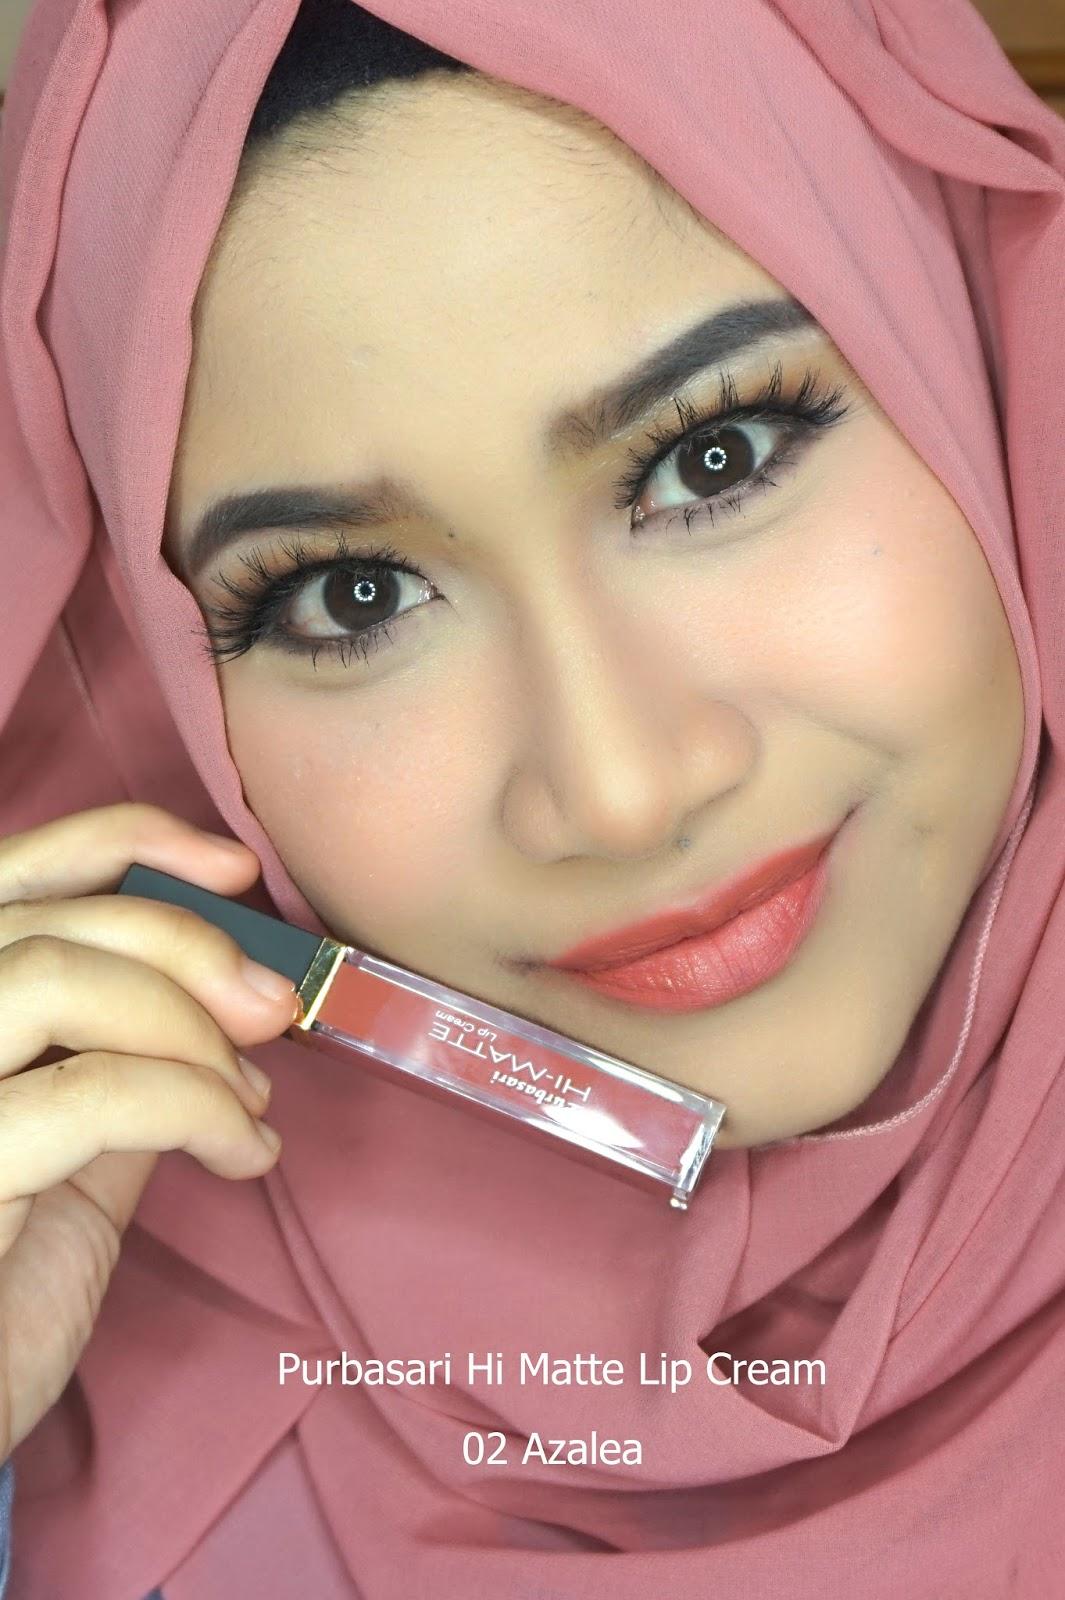 Hai Ariani Indonesian Beauty Blogger Purbasari Hi Matte Lip Cream Lipstik Paling  Original